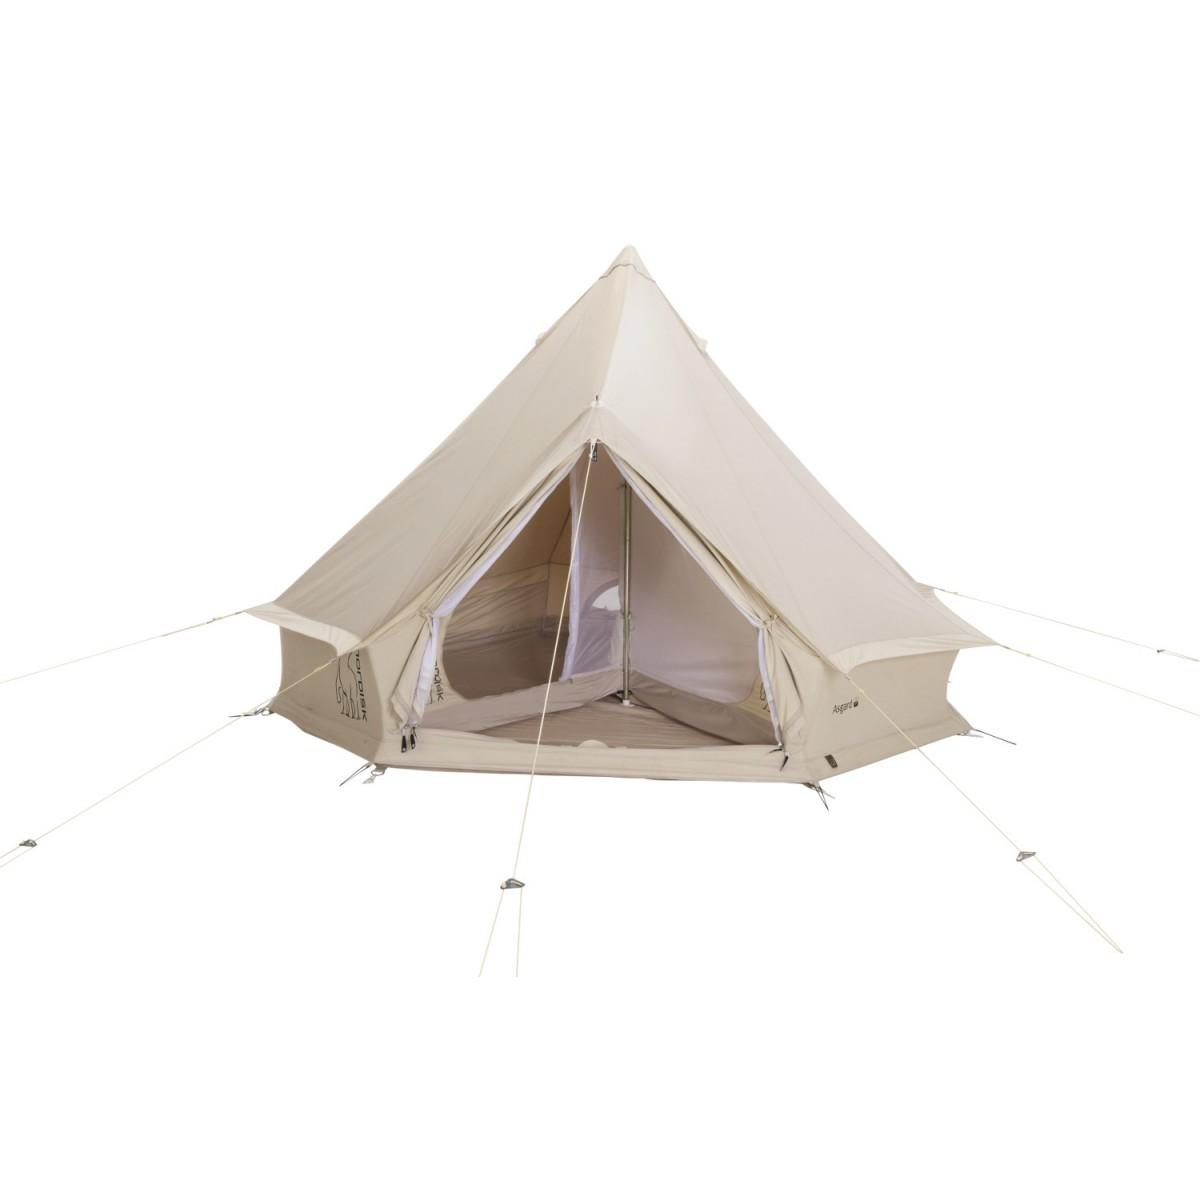 nordisk tente de groupe asgard 3 personnes tente camping bivouac. Black Bedroom Furniture Sets. Home Design Ideas